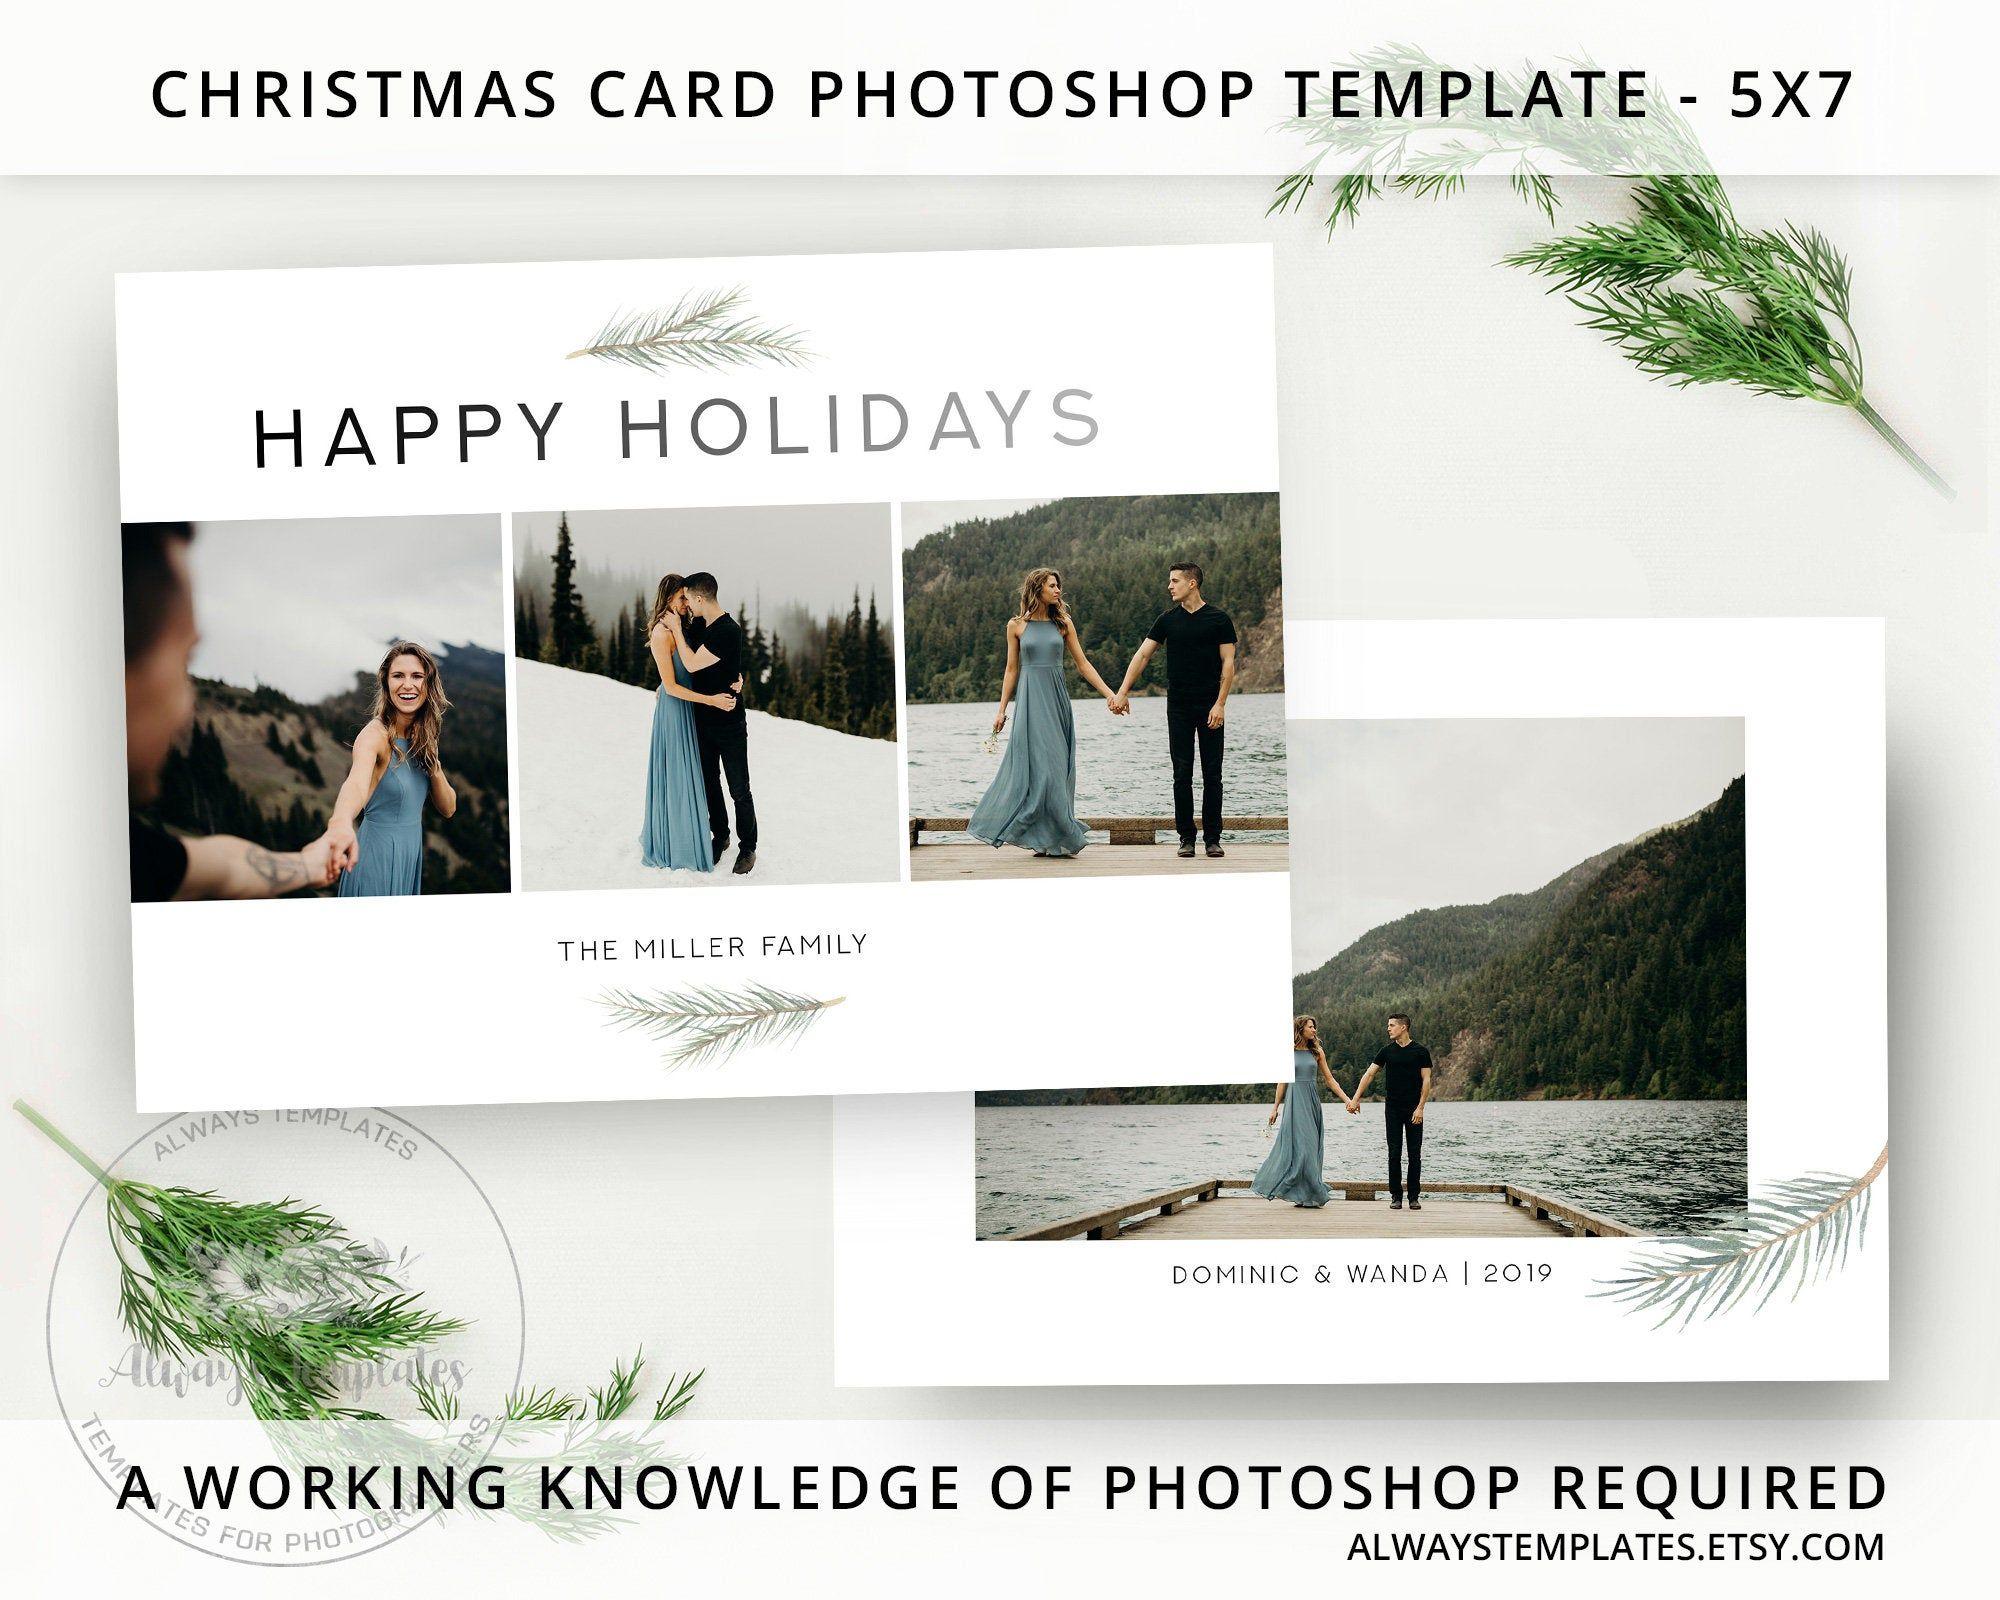 Christmas Card Template Photo Christmas Card Template Holiday Card Template Photoshop Christmas Card Template Psd Template 5x7 Card Photoshop Christmas Card Template Christmas Card Template Holiday Card Template